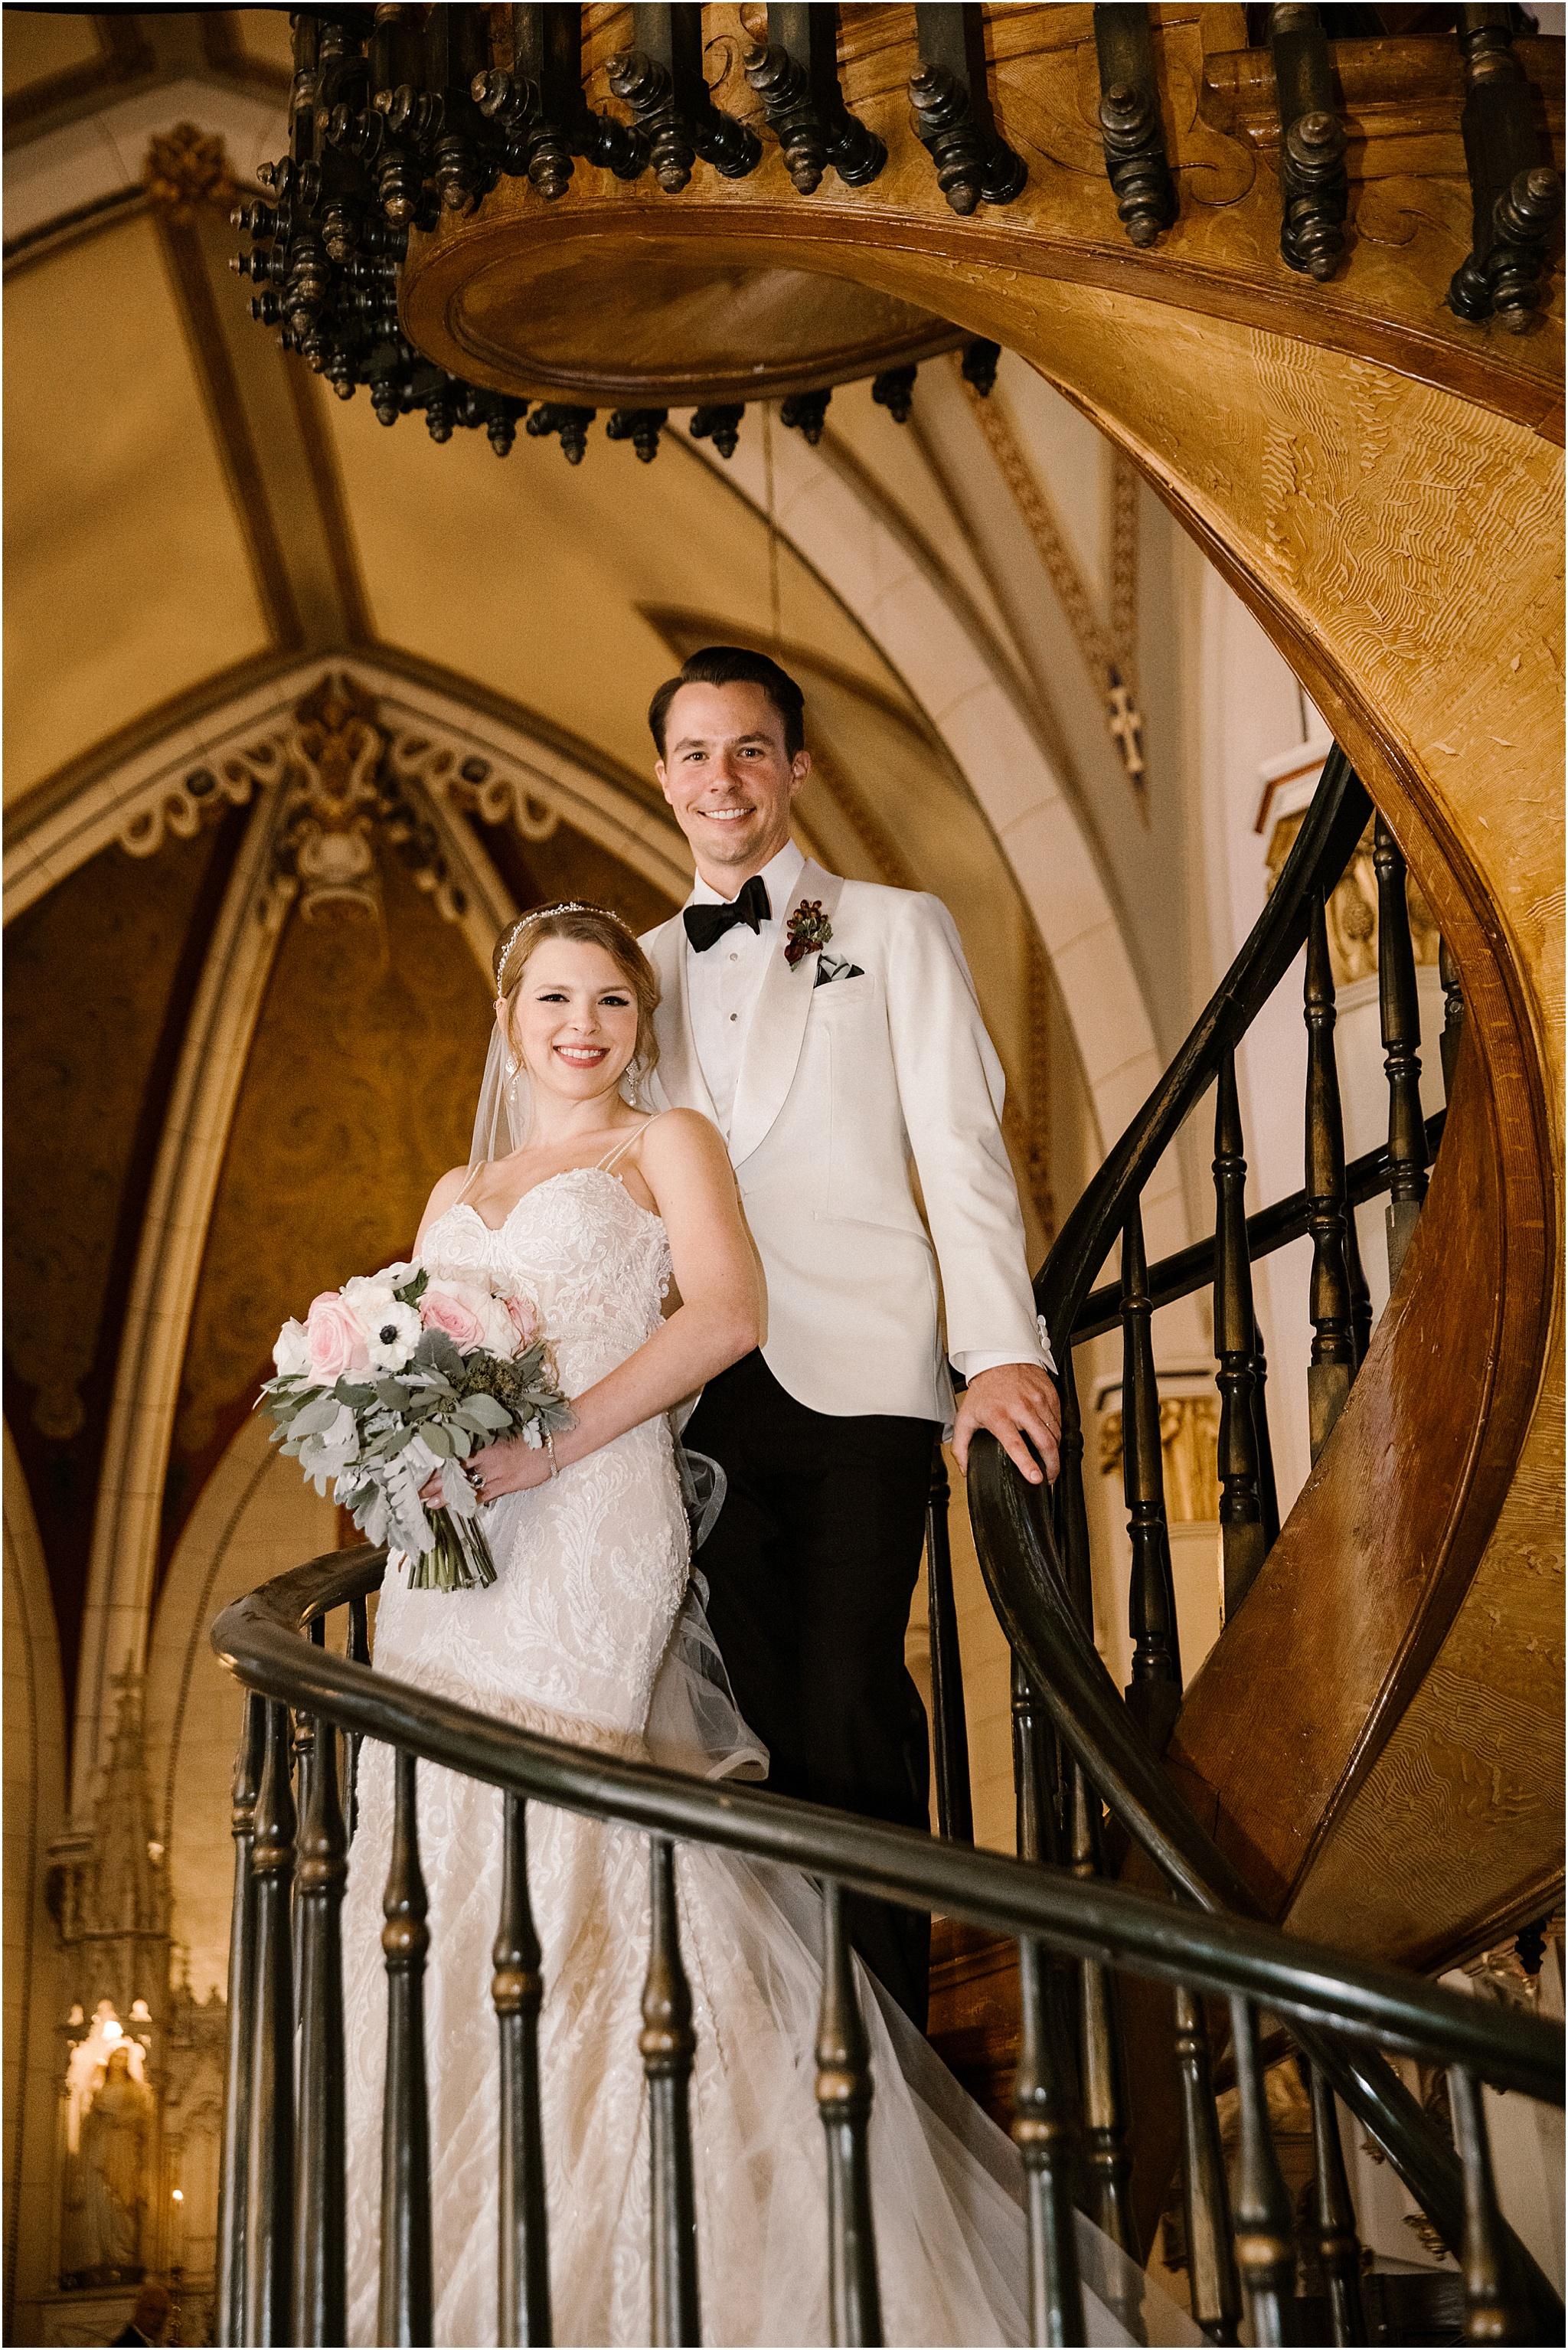 BLUE ROSE PHOTOGRAPHY SANTA FE WEDDING_29